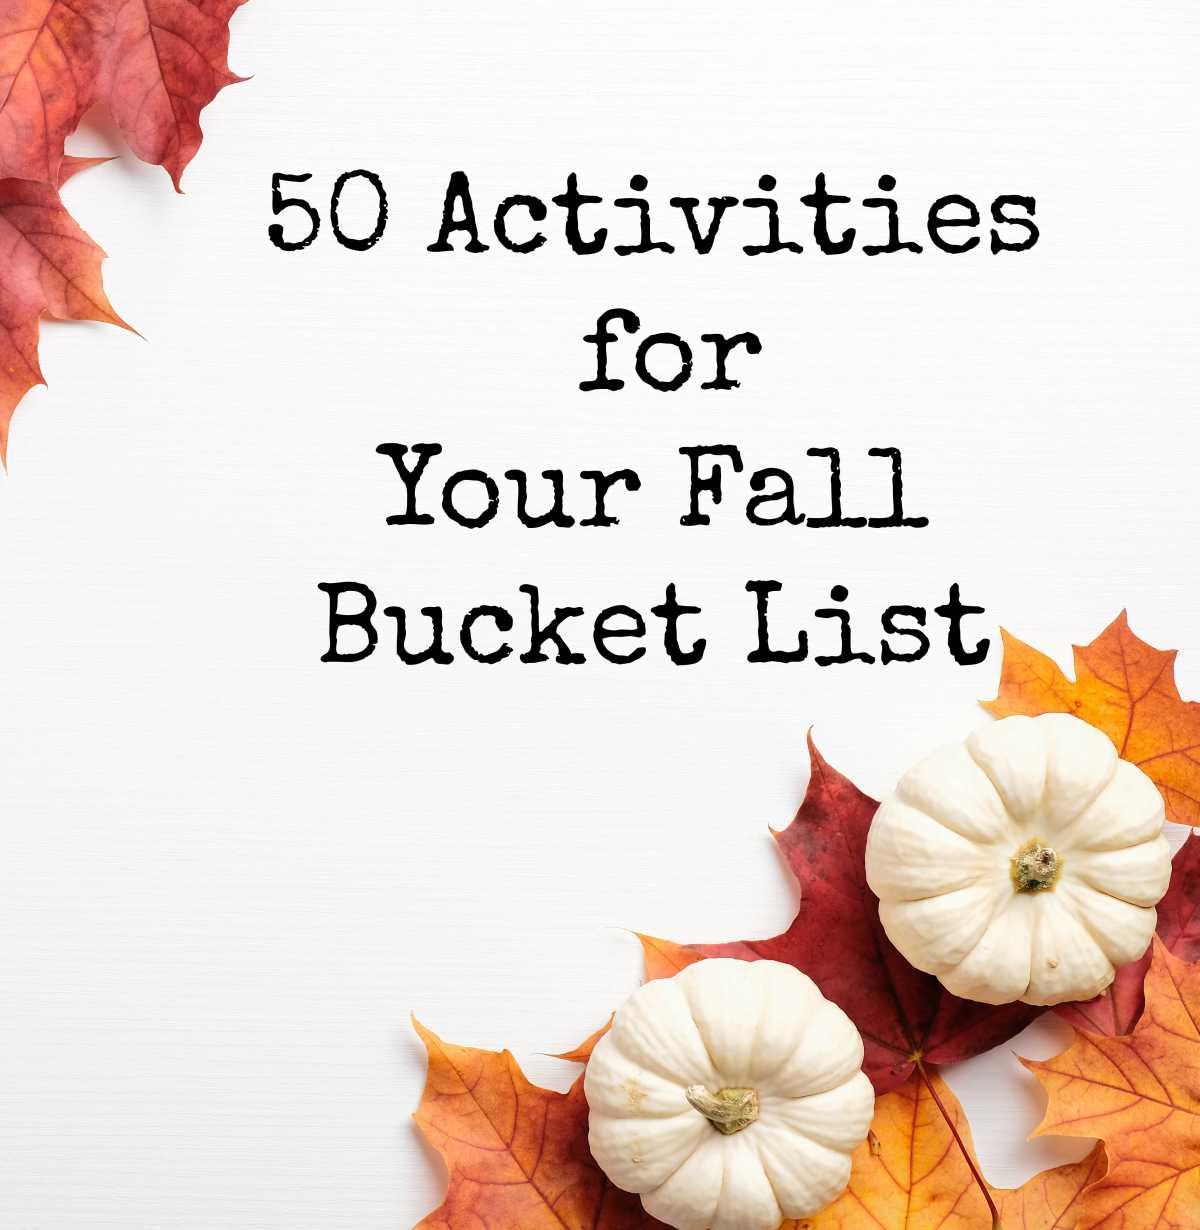 50 Activities for Your Fall BucketList